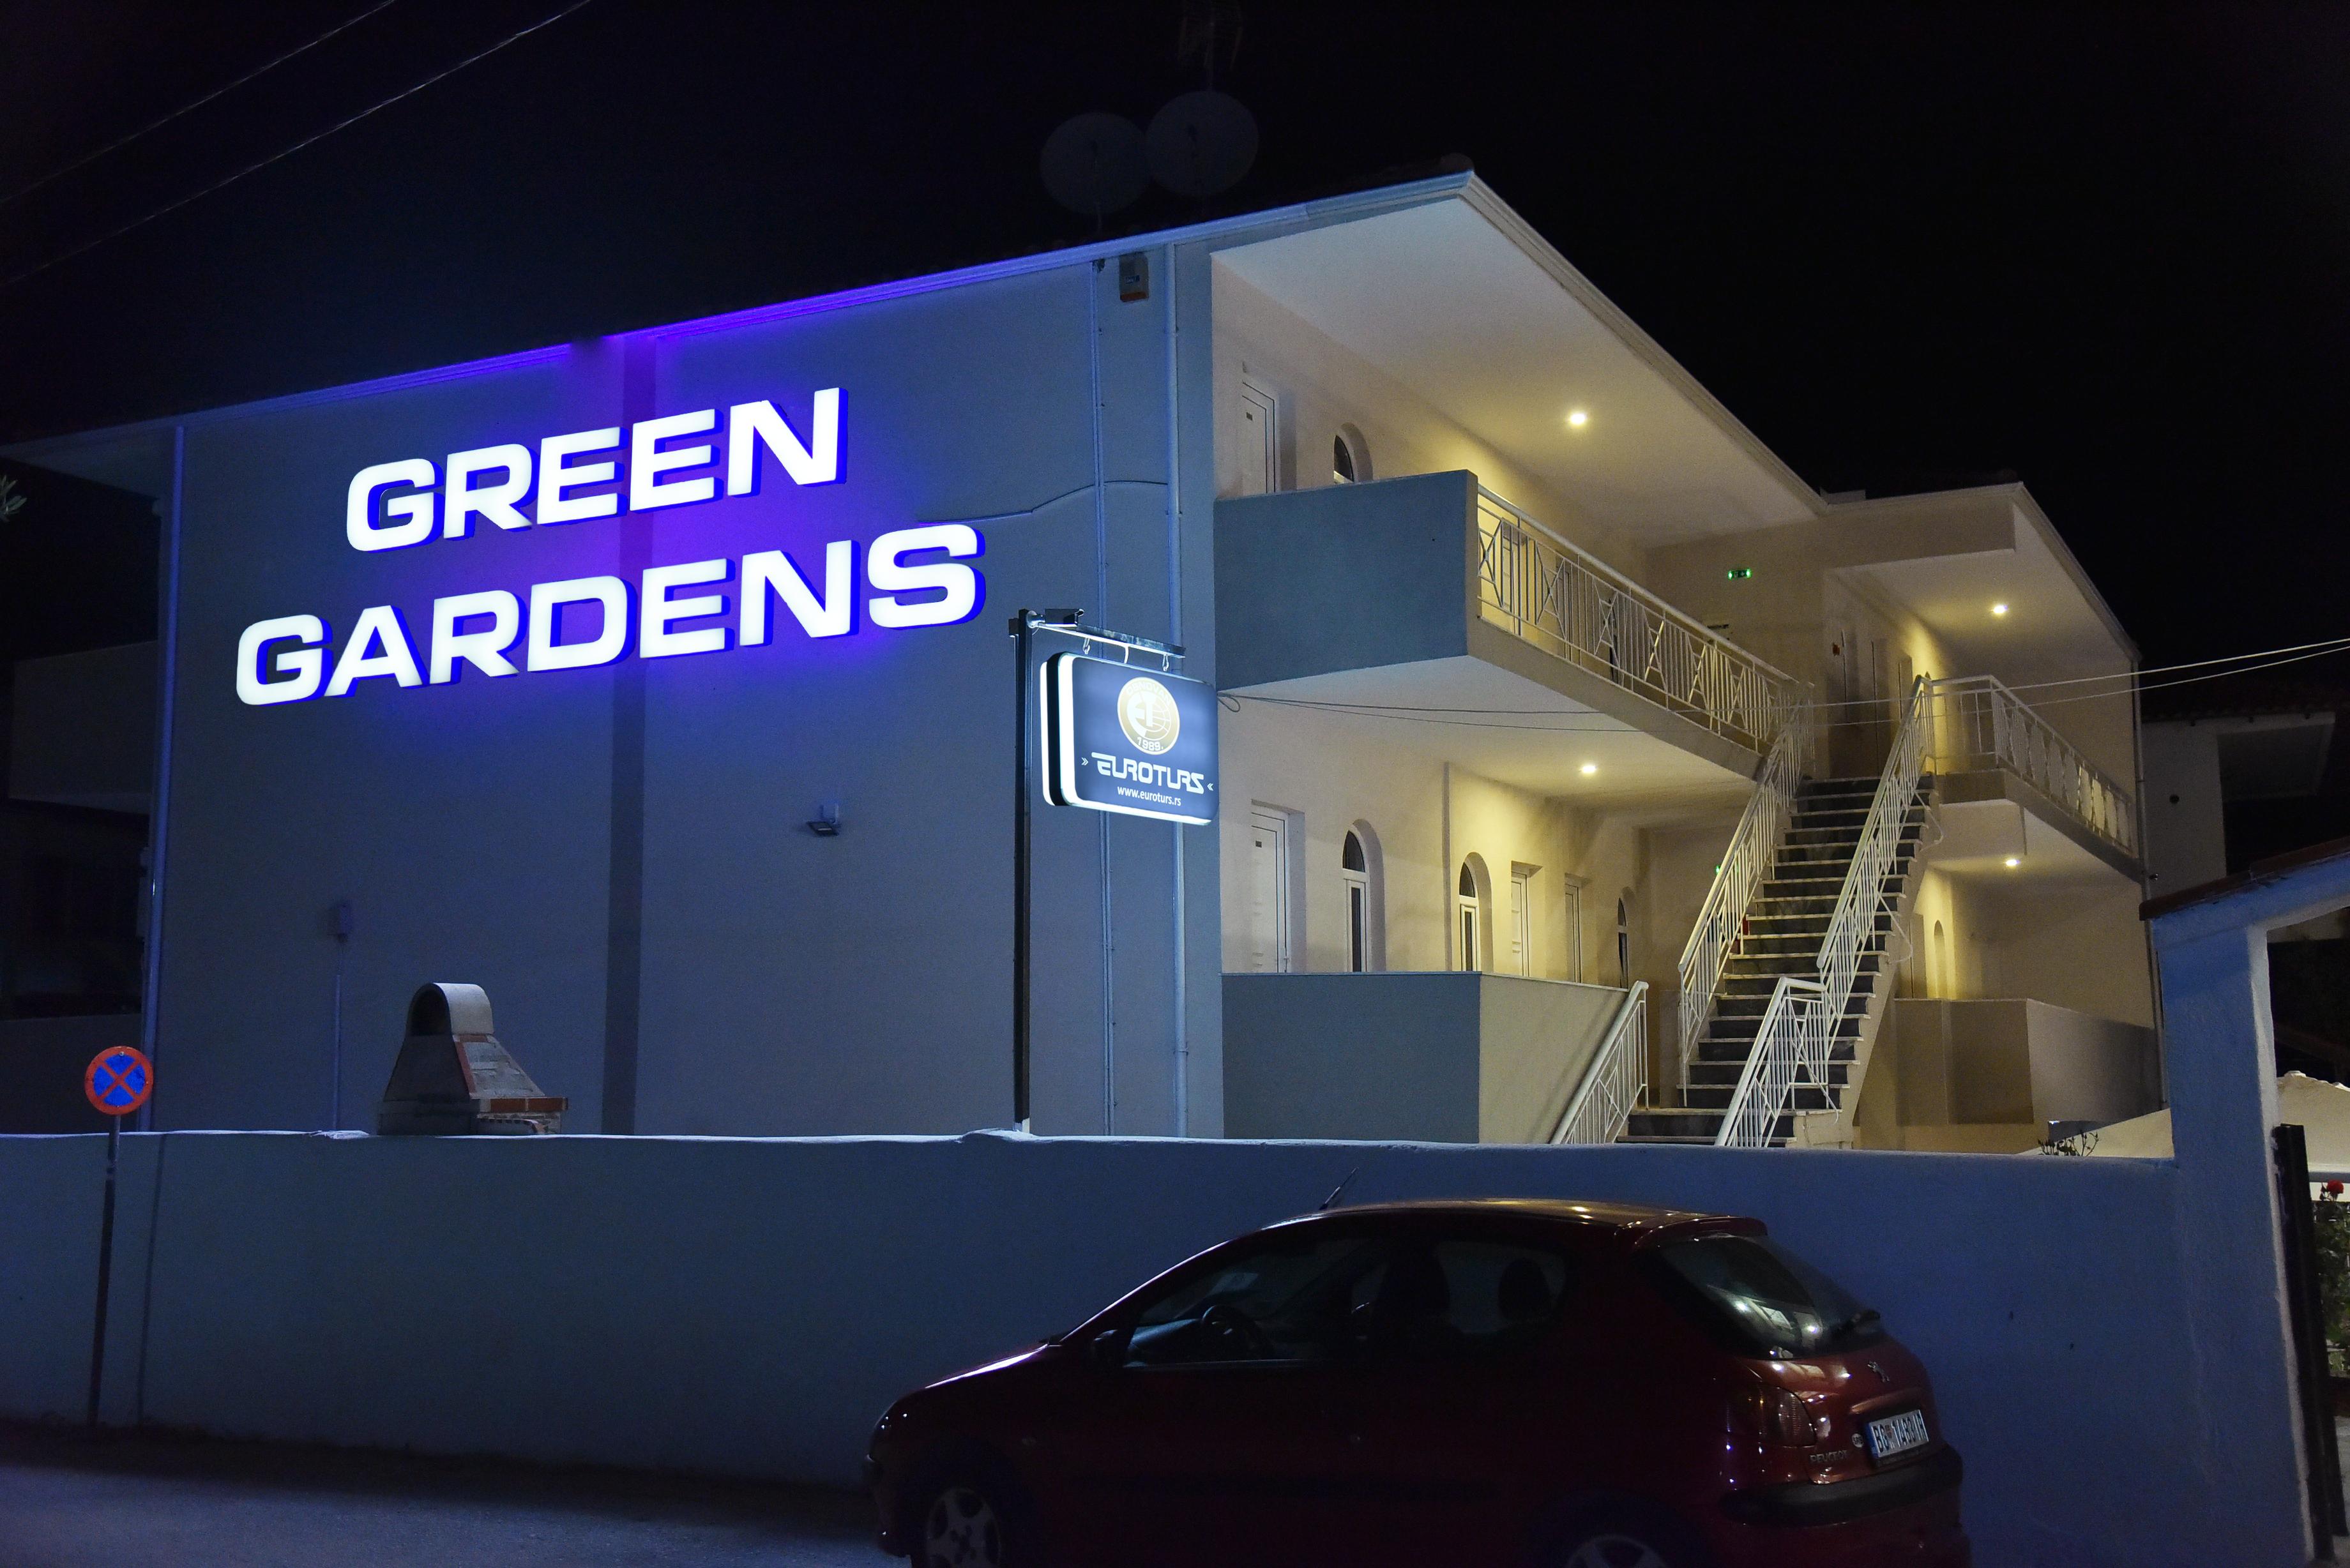 Grcka apartmani letovanje, Polihrono Halkidiki, Green Gardens, kuća A noću